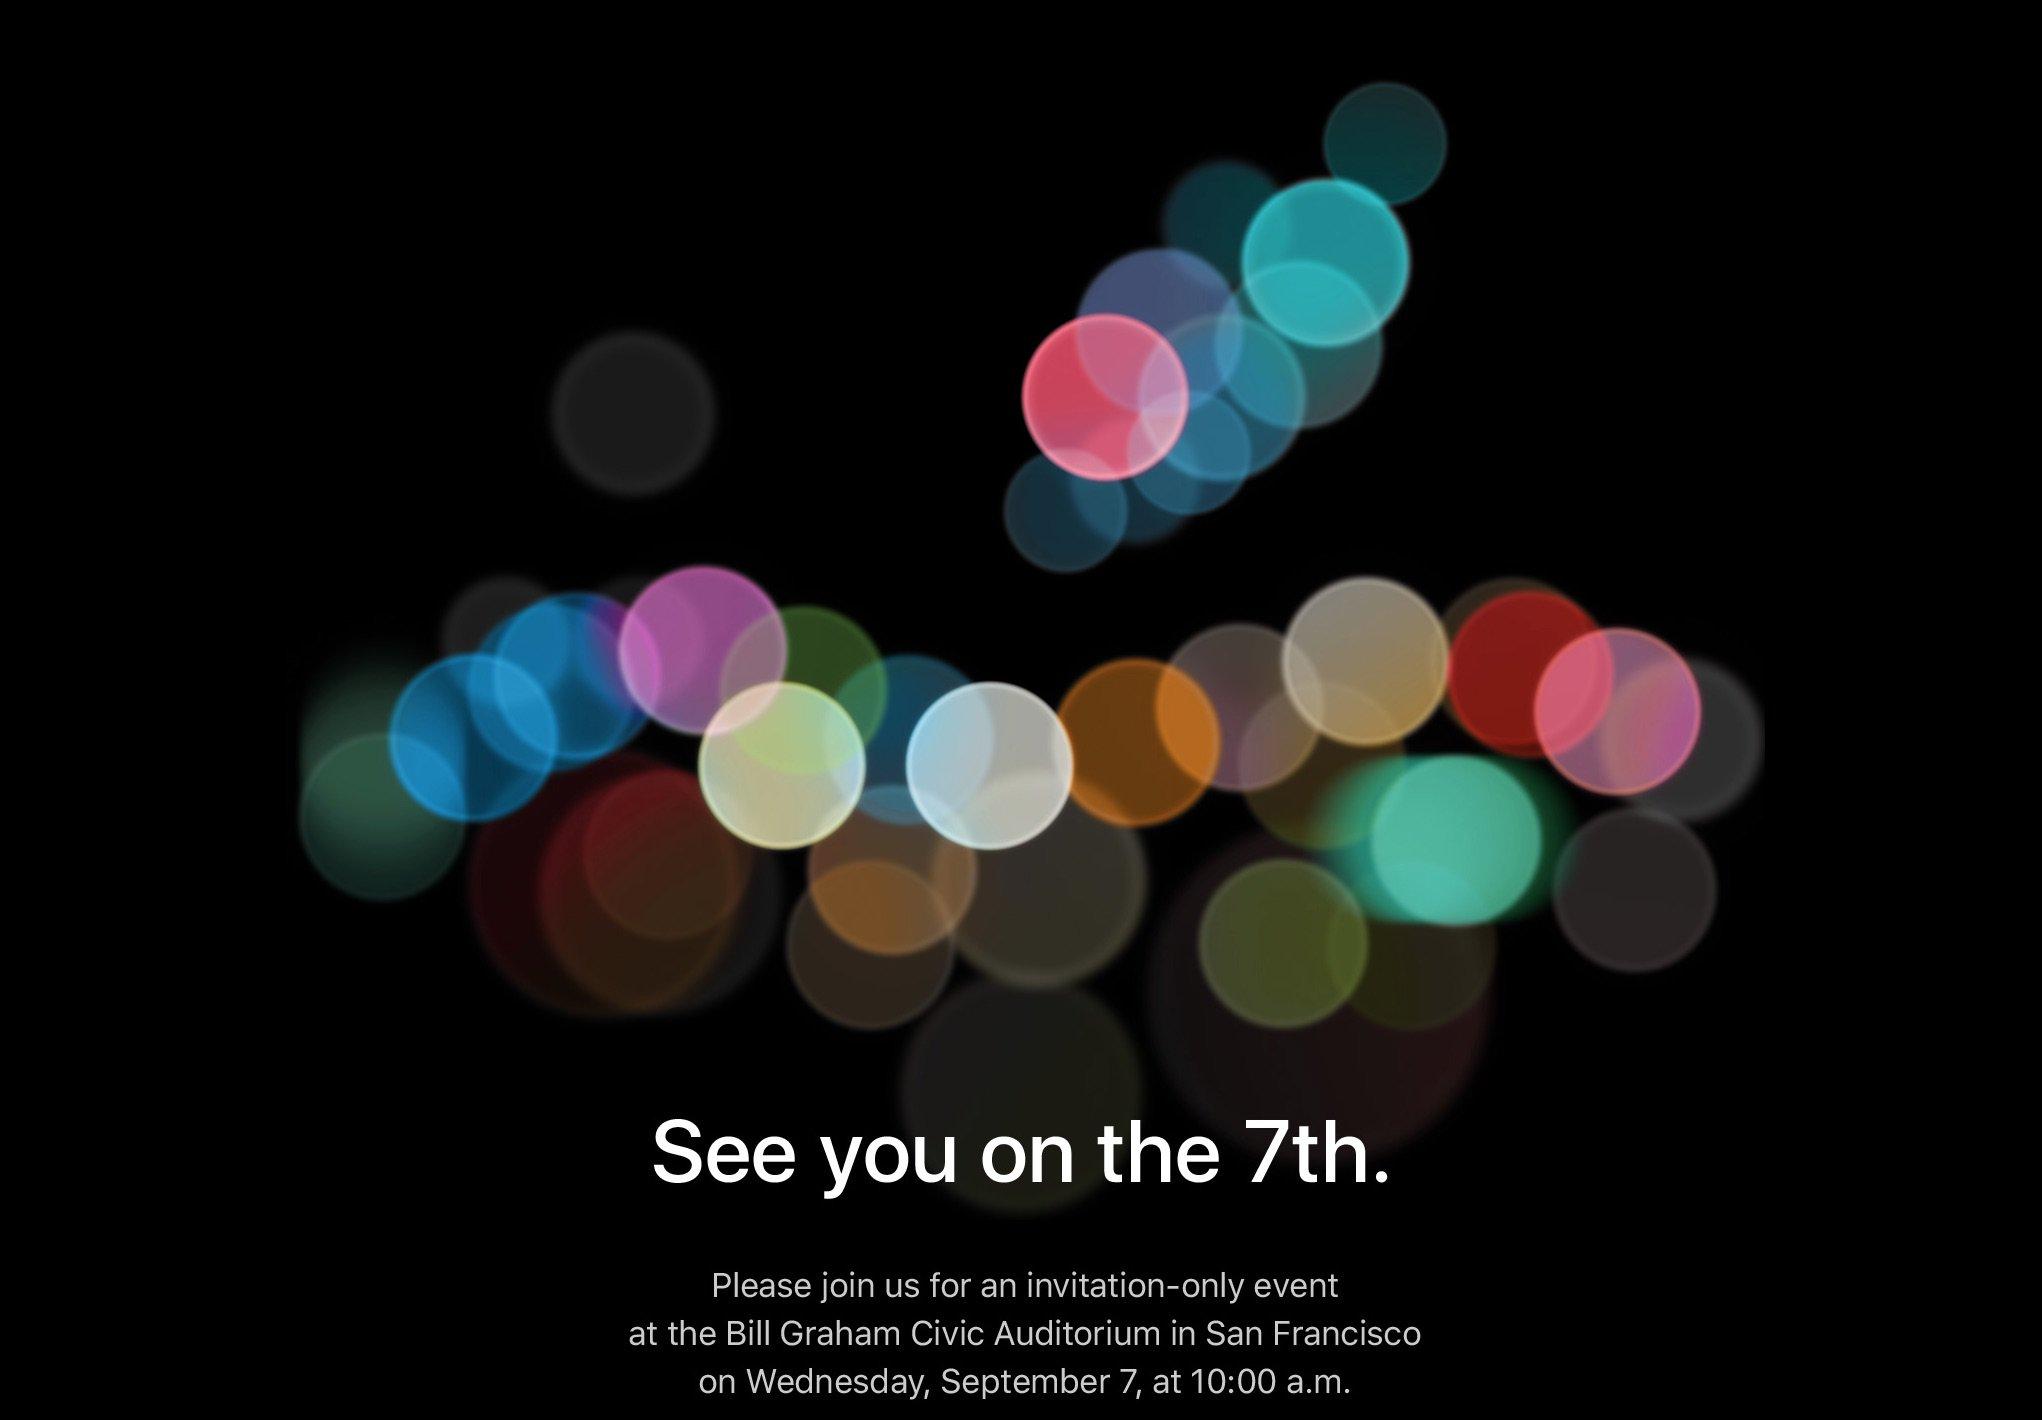 apple-event-iphone-2016